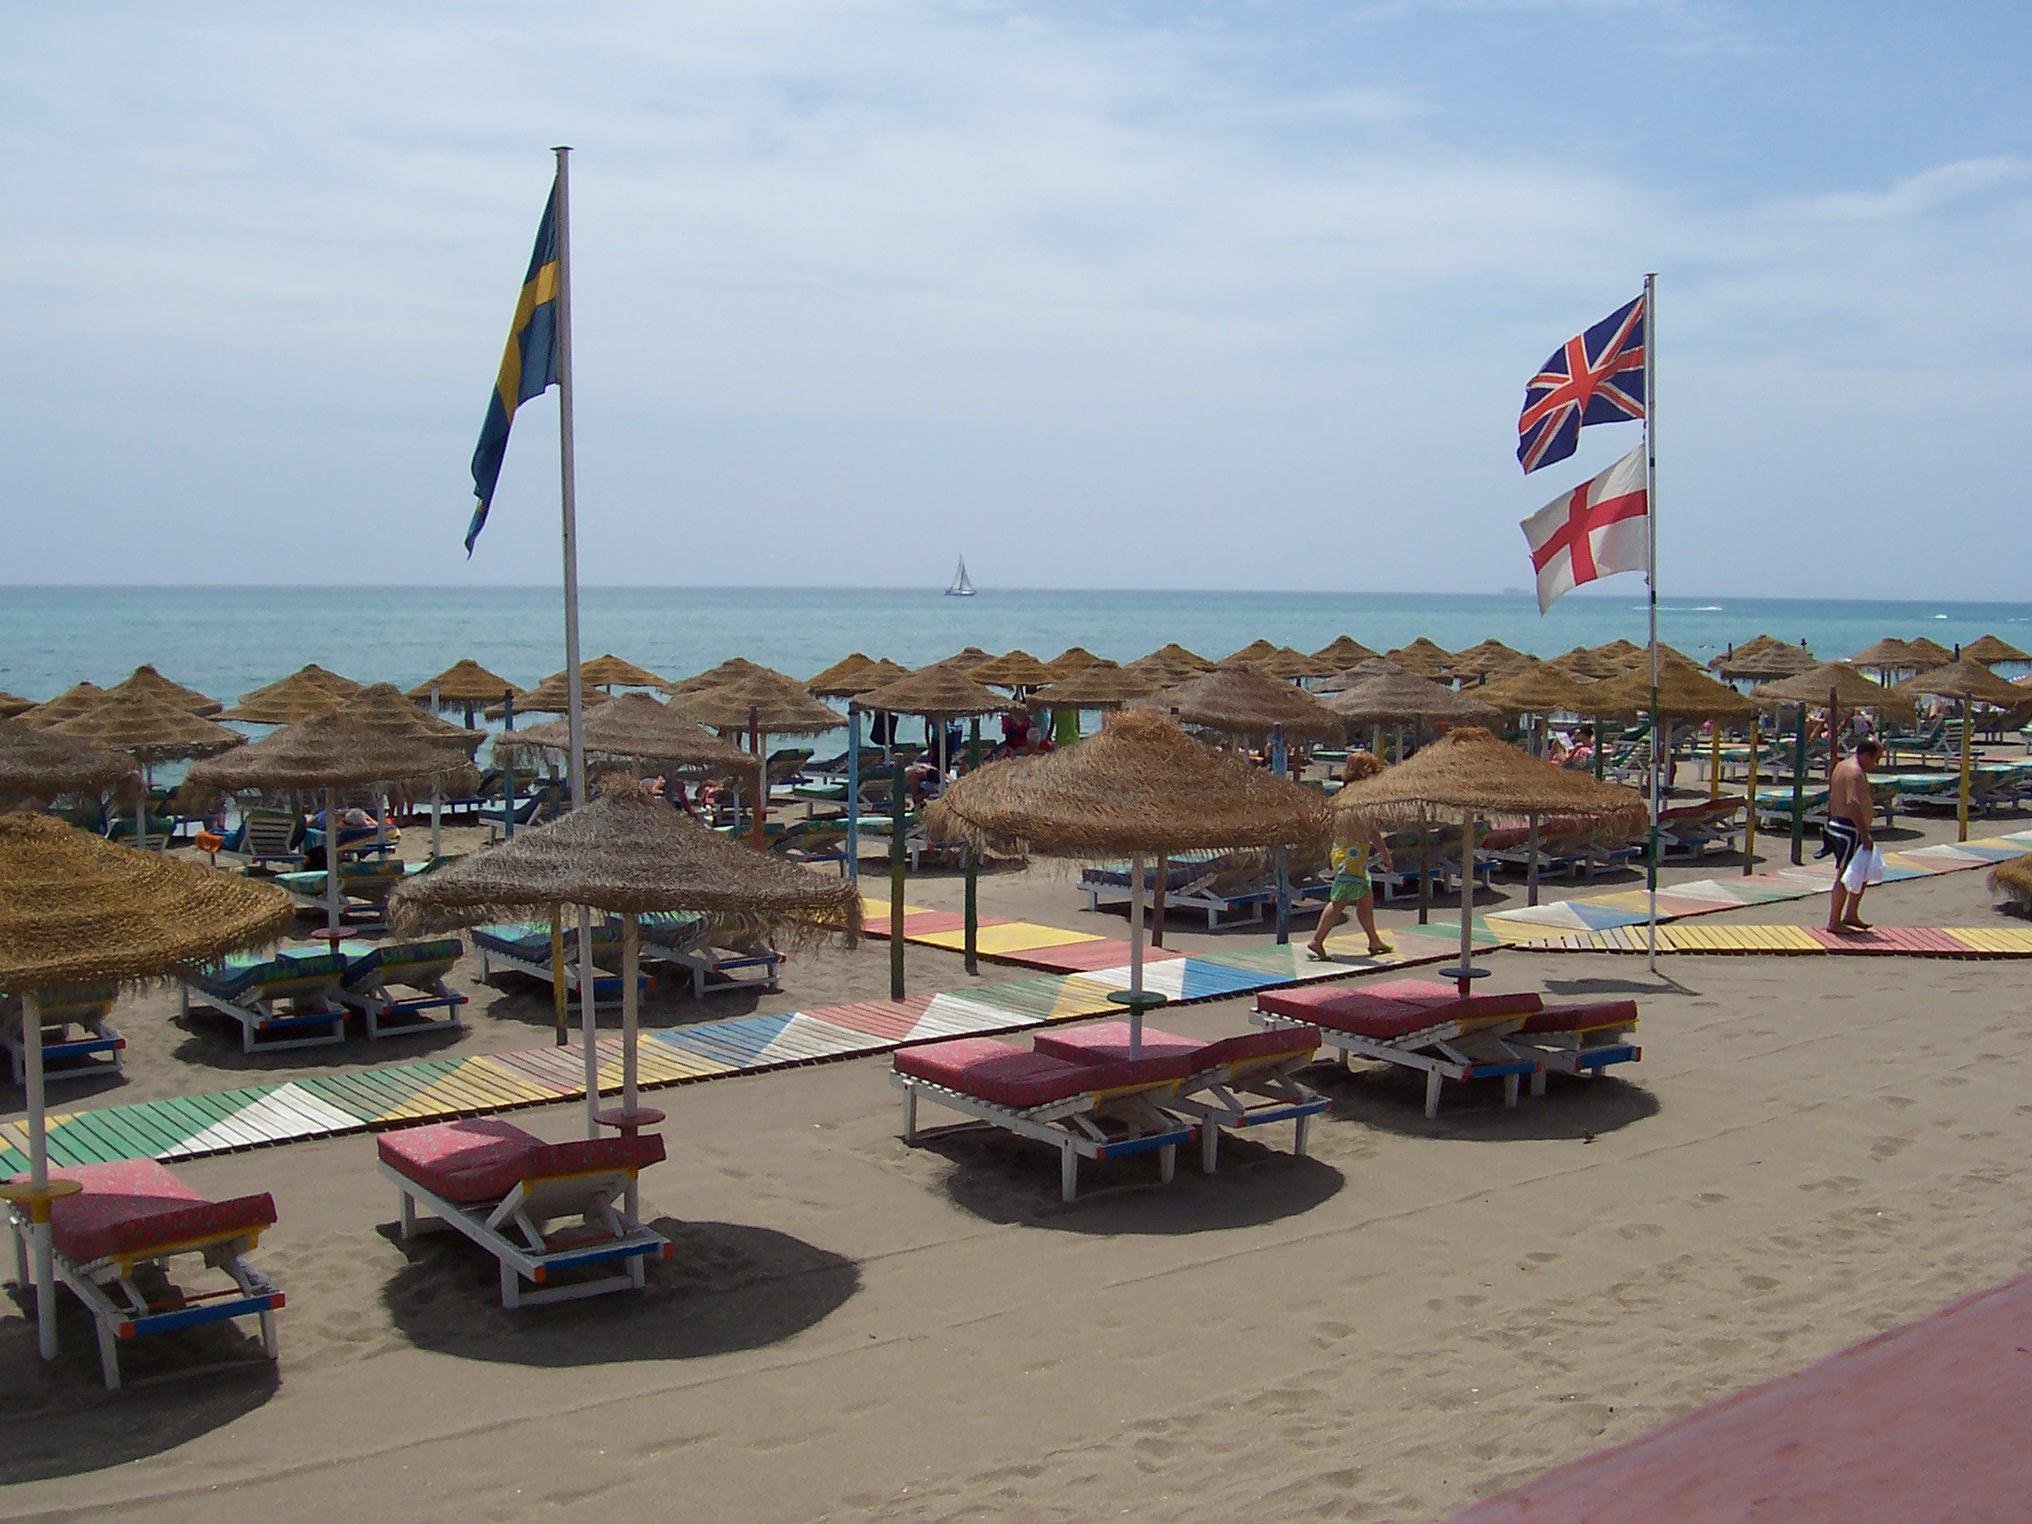 Playa Torrequebrada